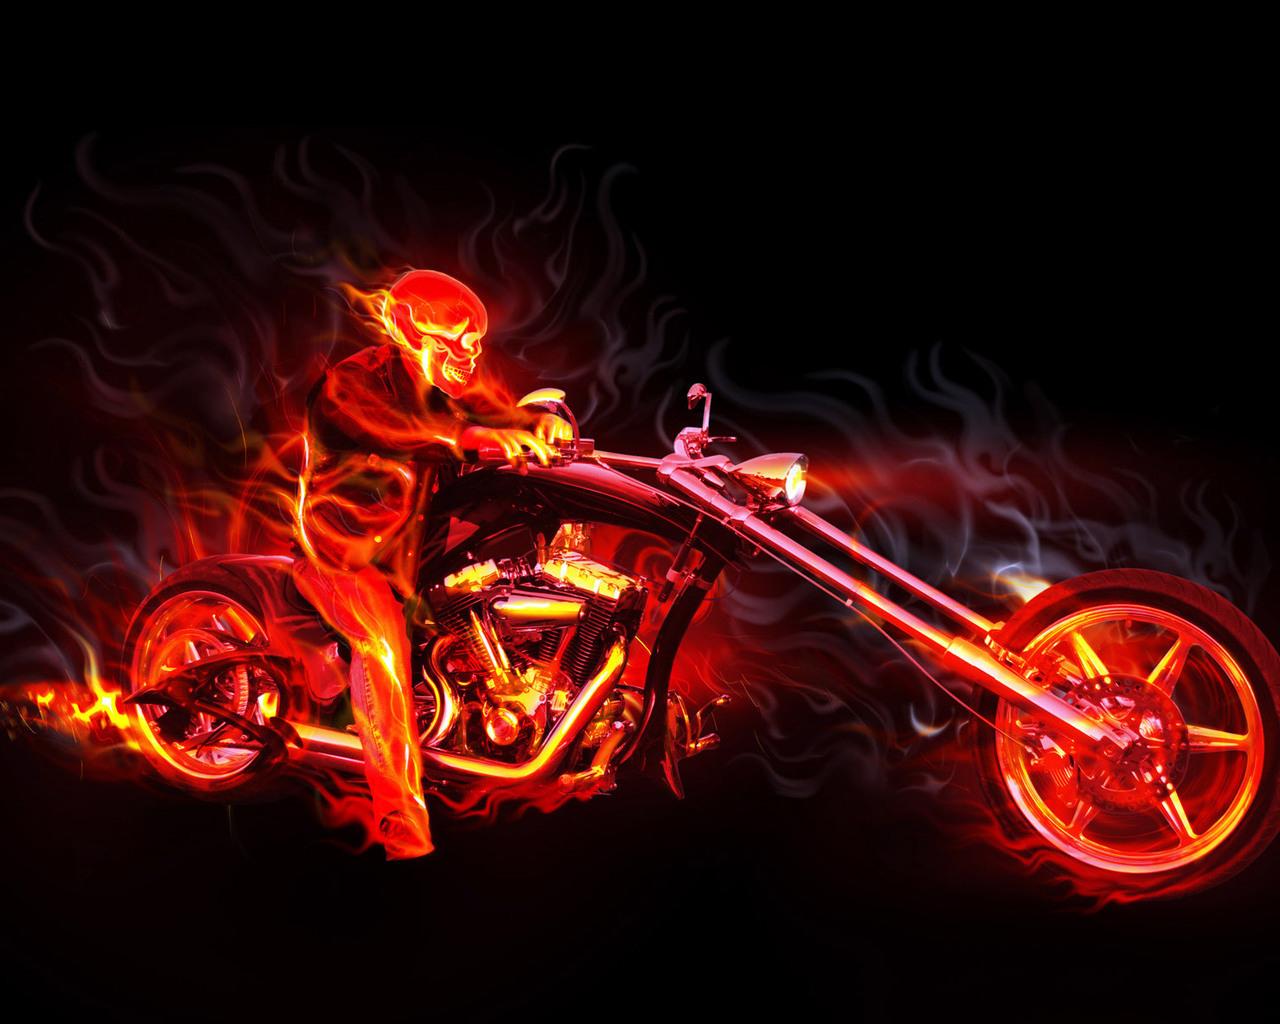 wallpaper Ghost Rider Wallpaper Download hd wallpaper 1280x1024